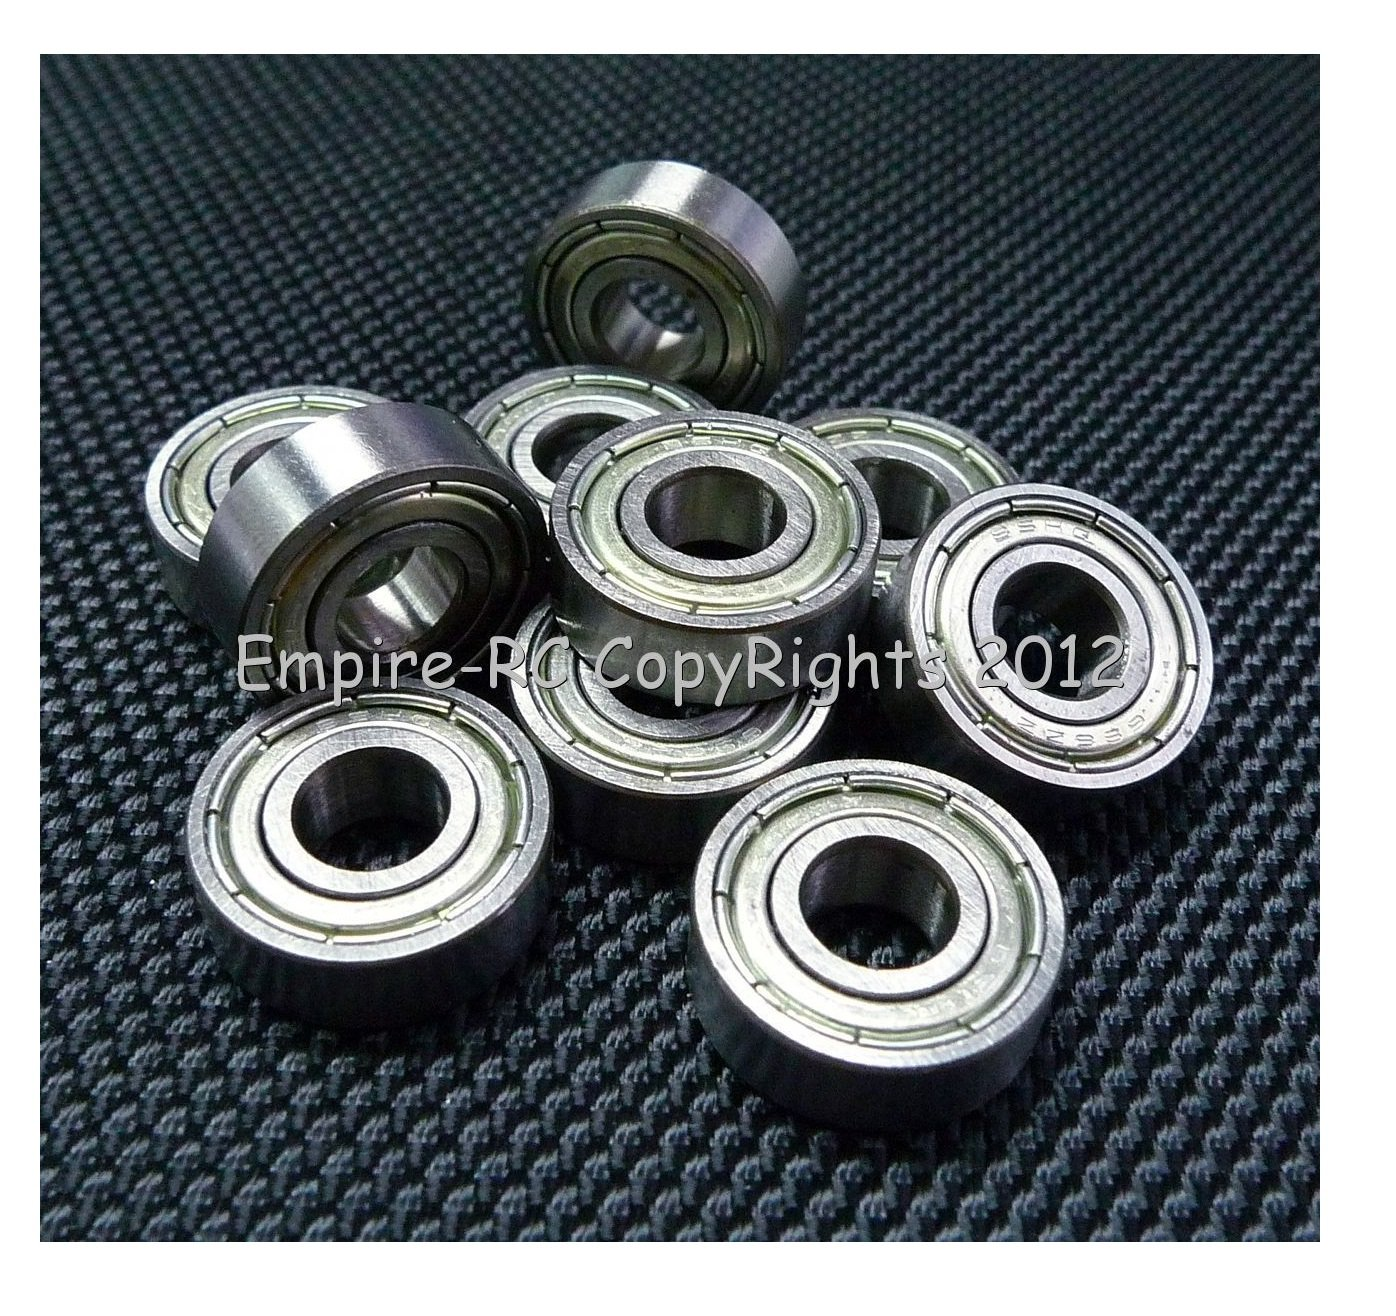 12x24x6 mm 10pcs 6901-2RS Black Rubber Sealed Ball Bearing Bearings 6901RS